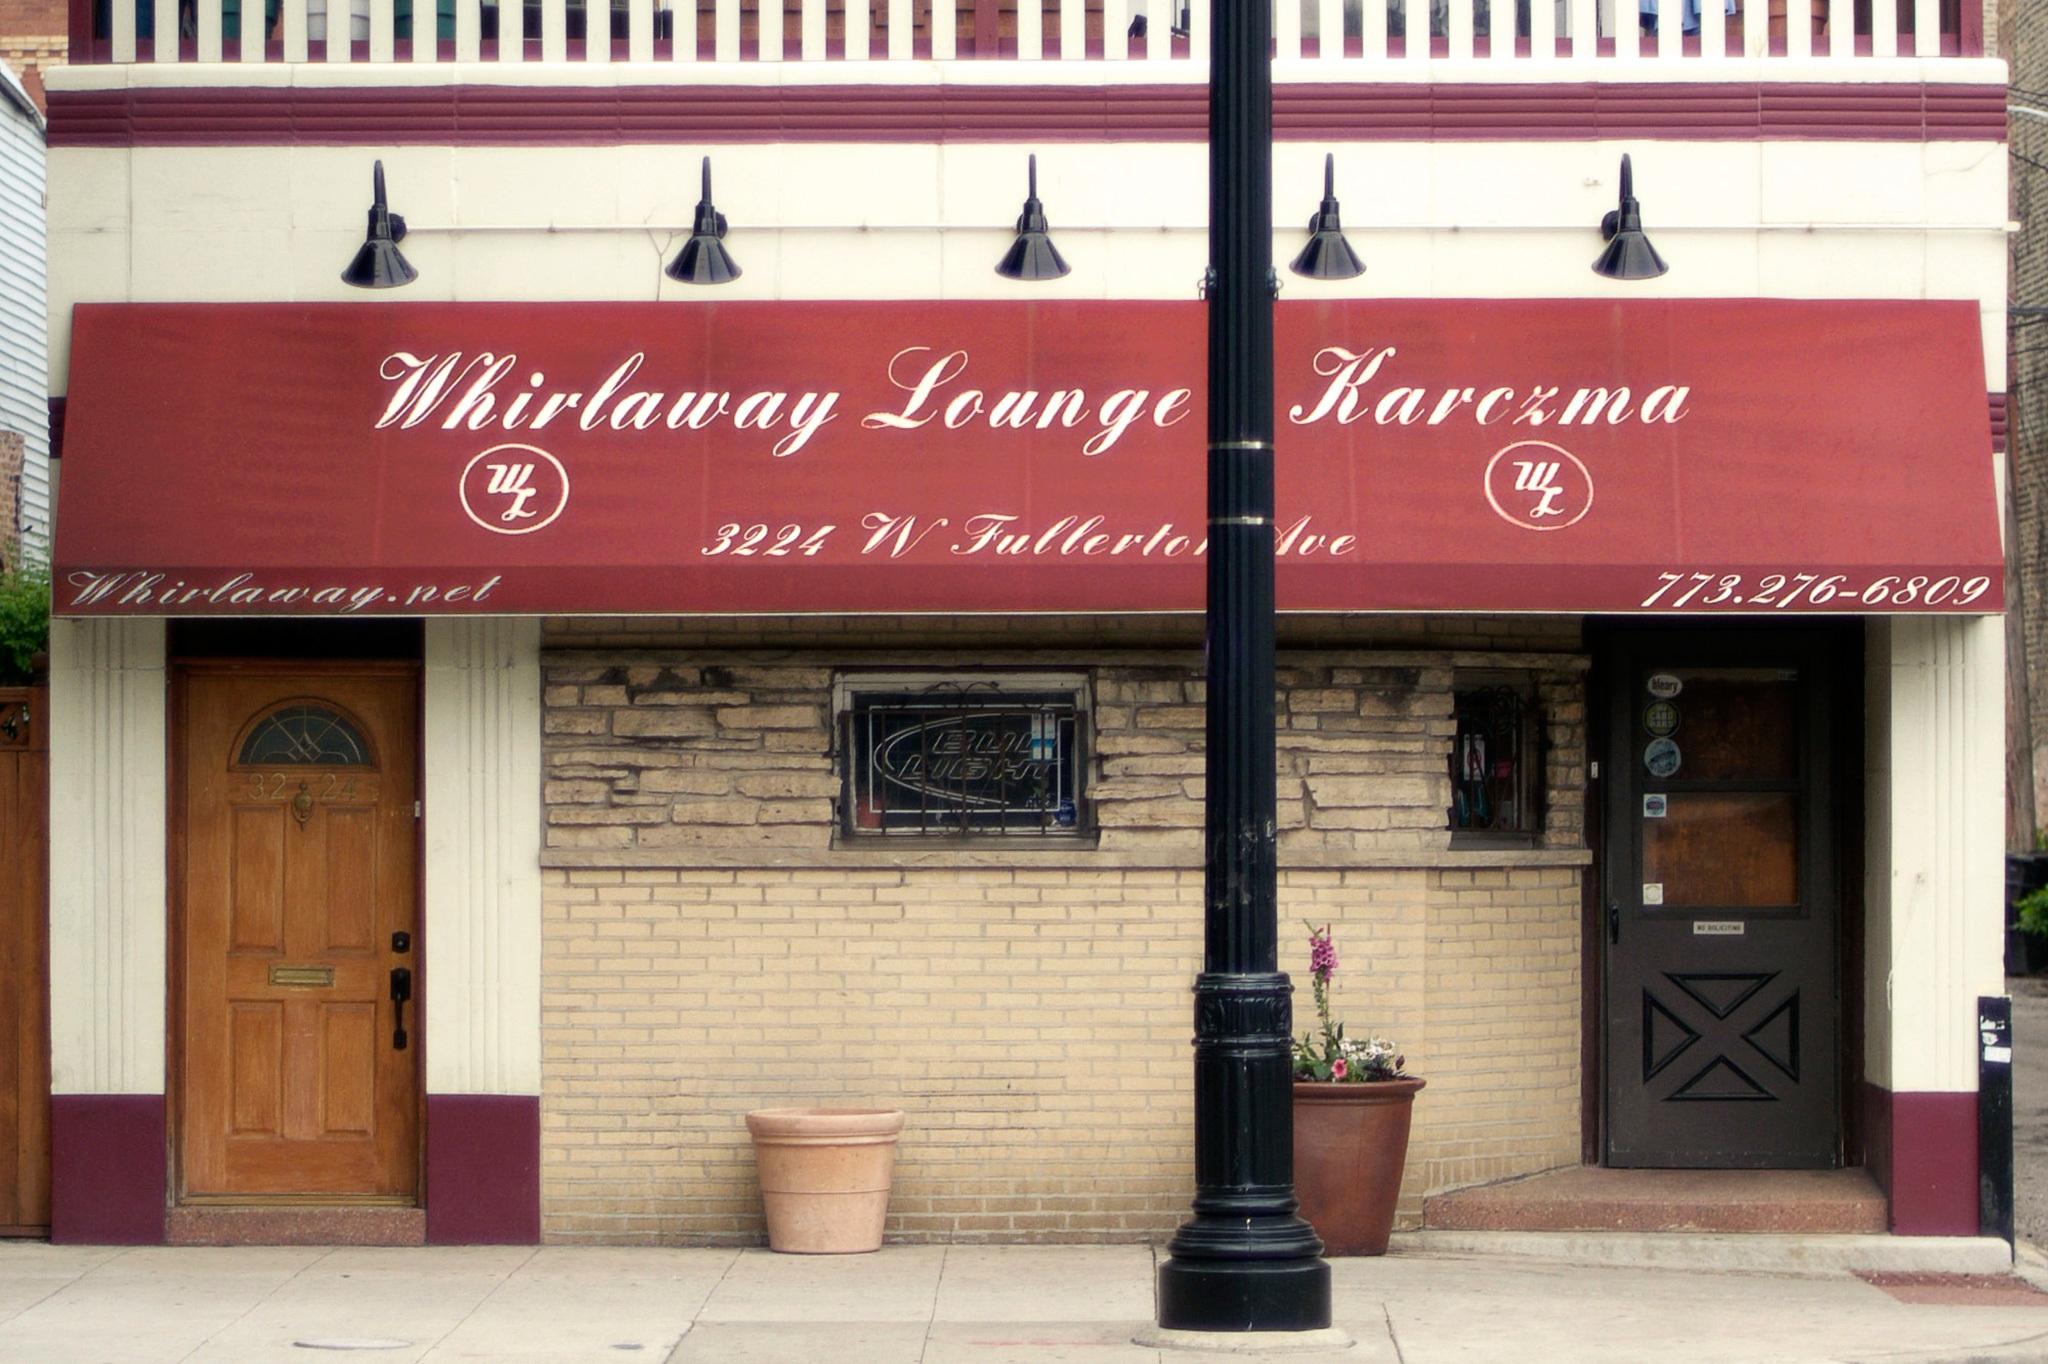 Whirlaway Lounge